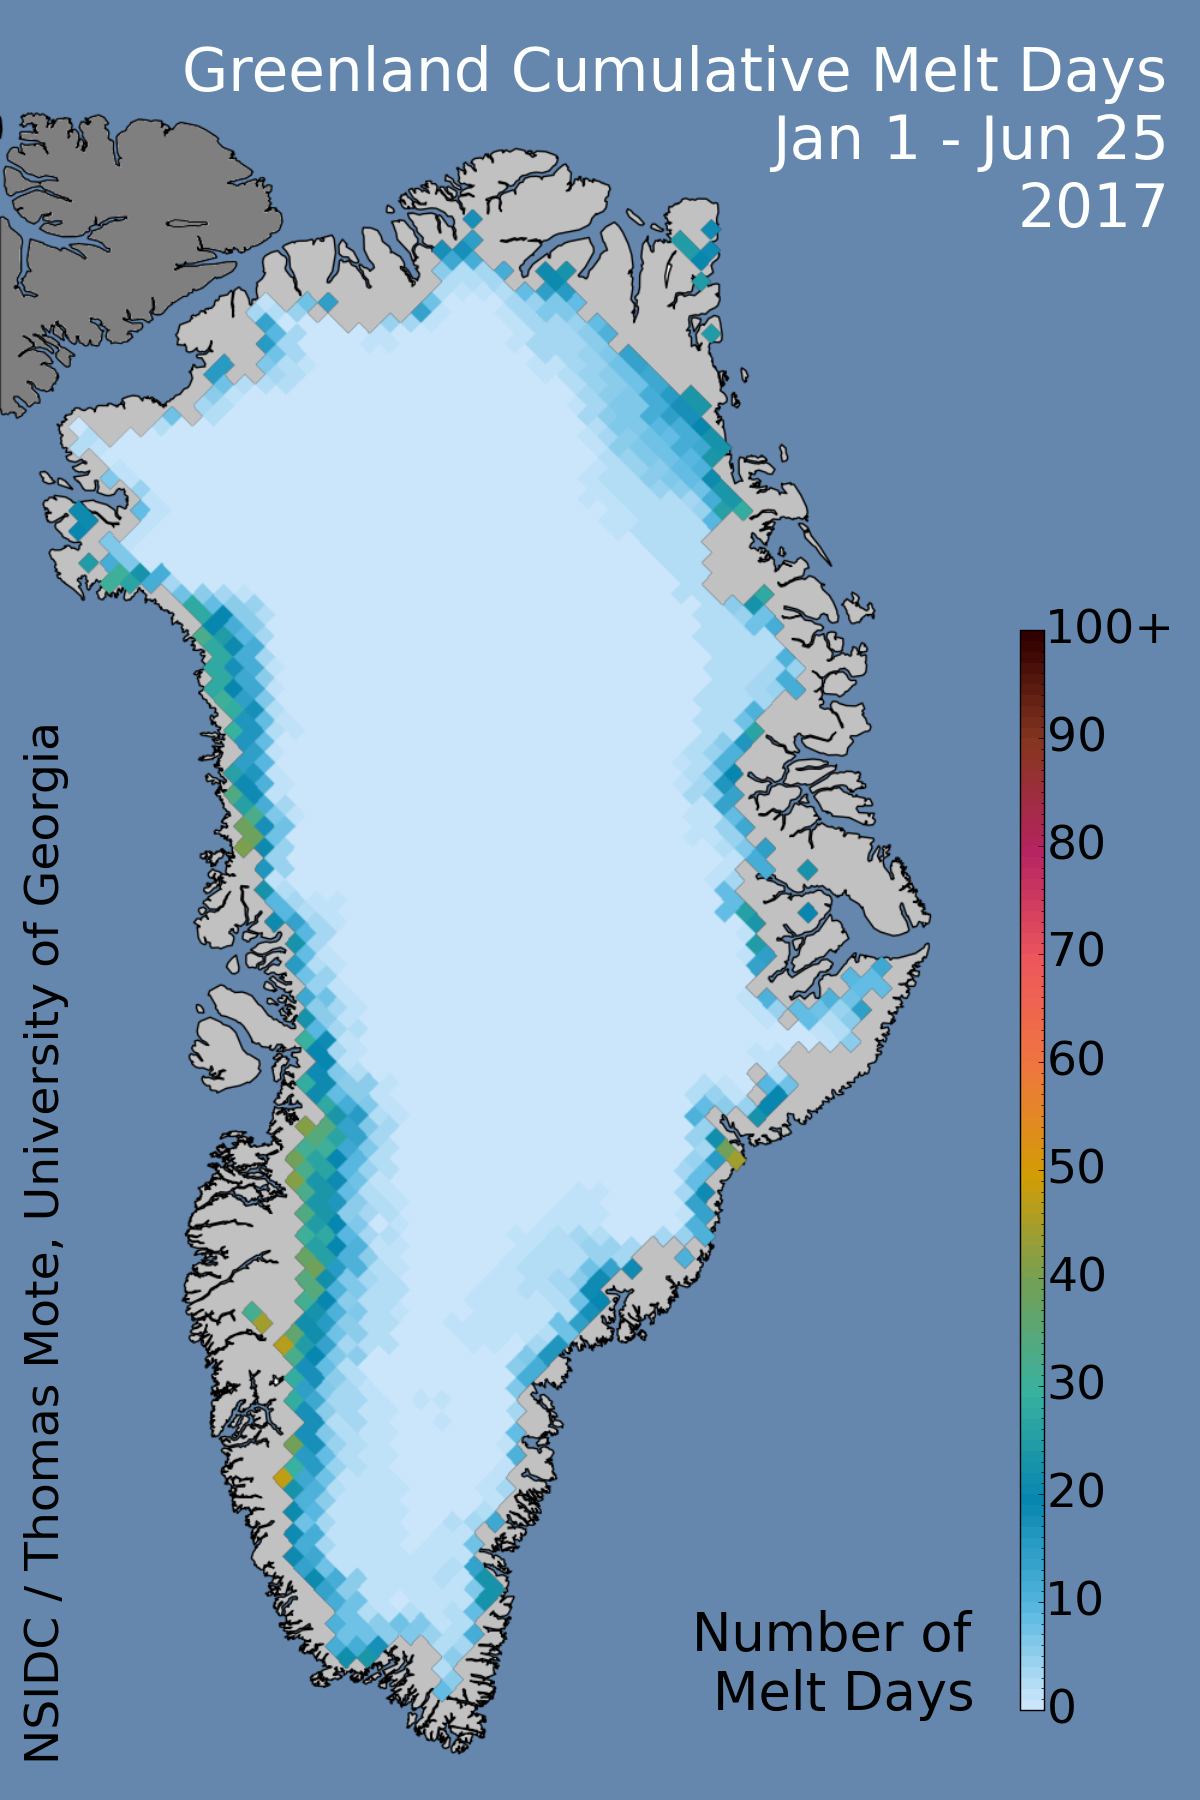 Grönland kumulativa Melt dagar per dag